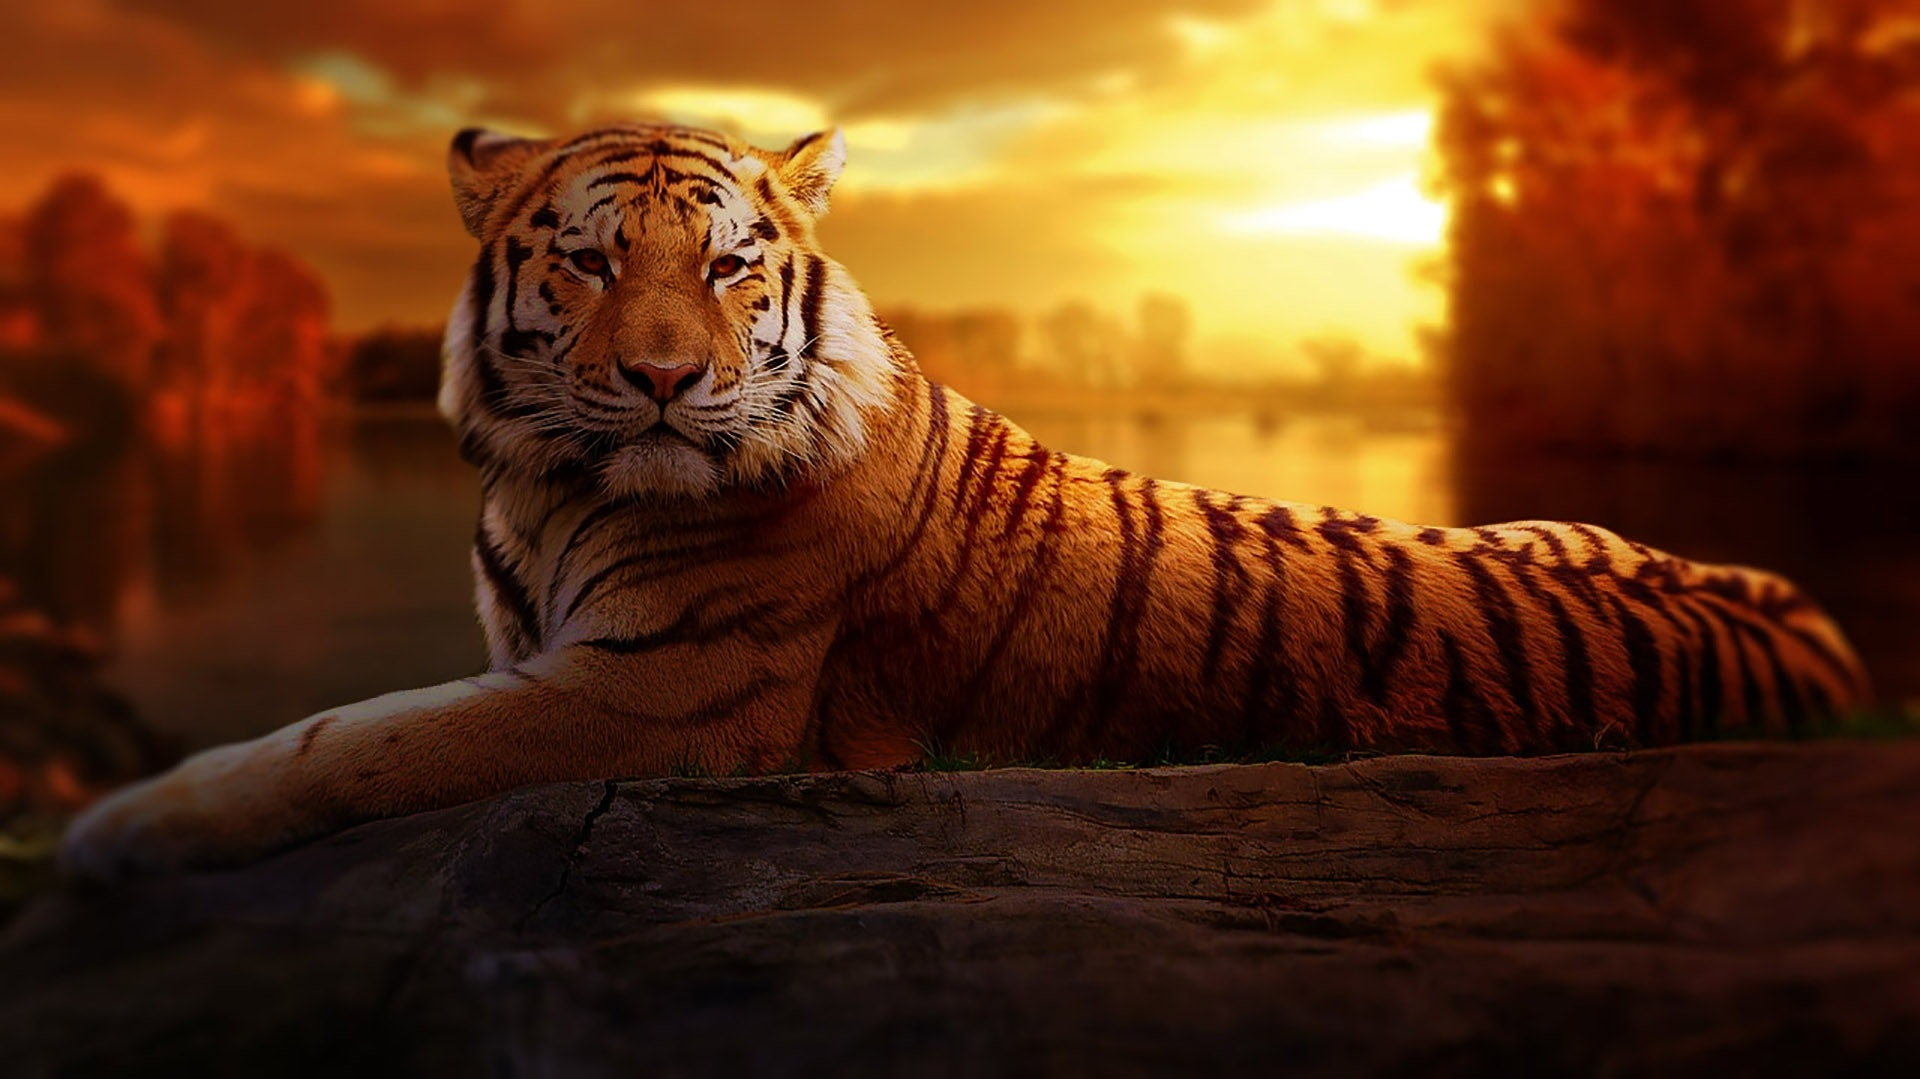 Tiger In Macro Shot Free Stock Photo